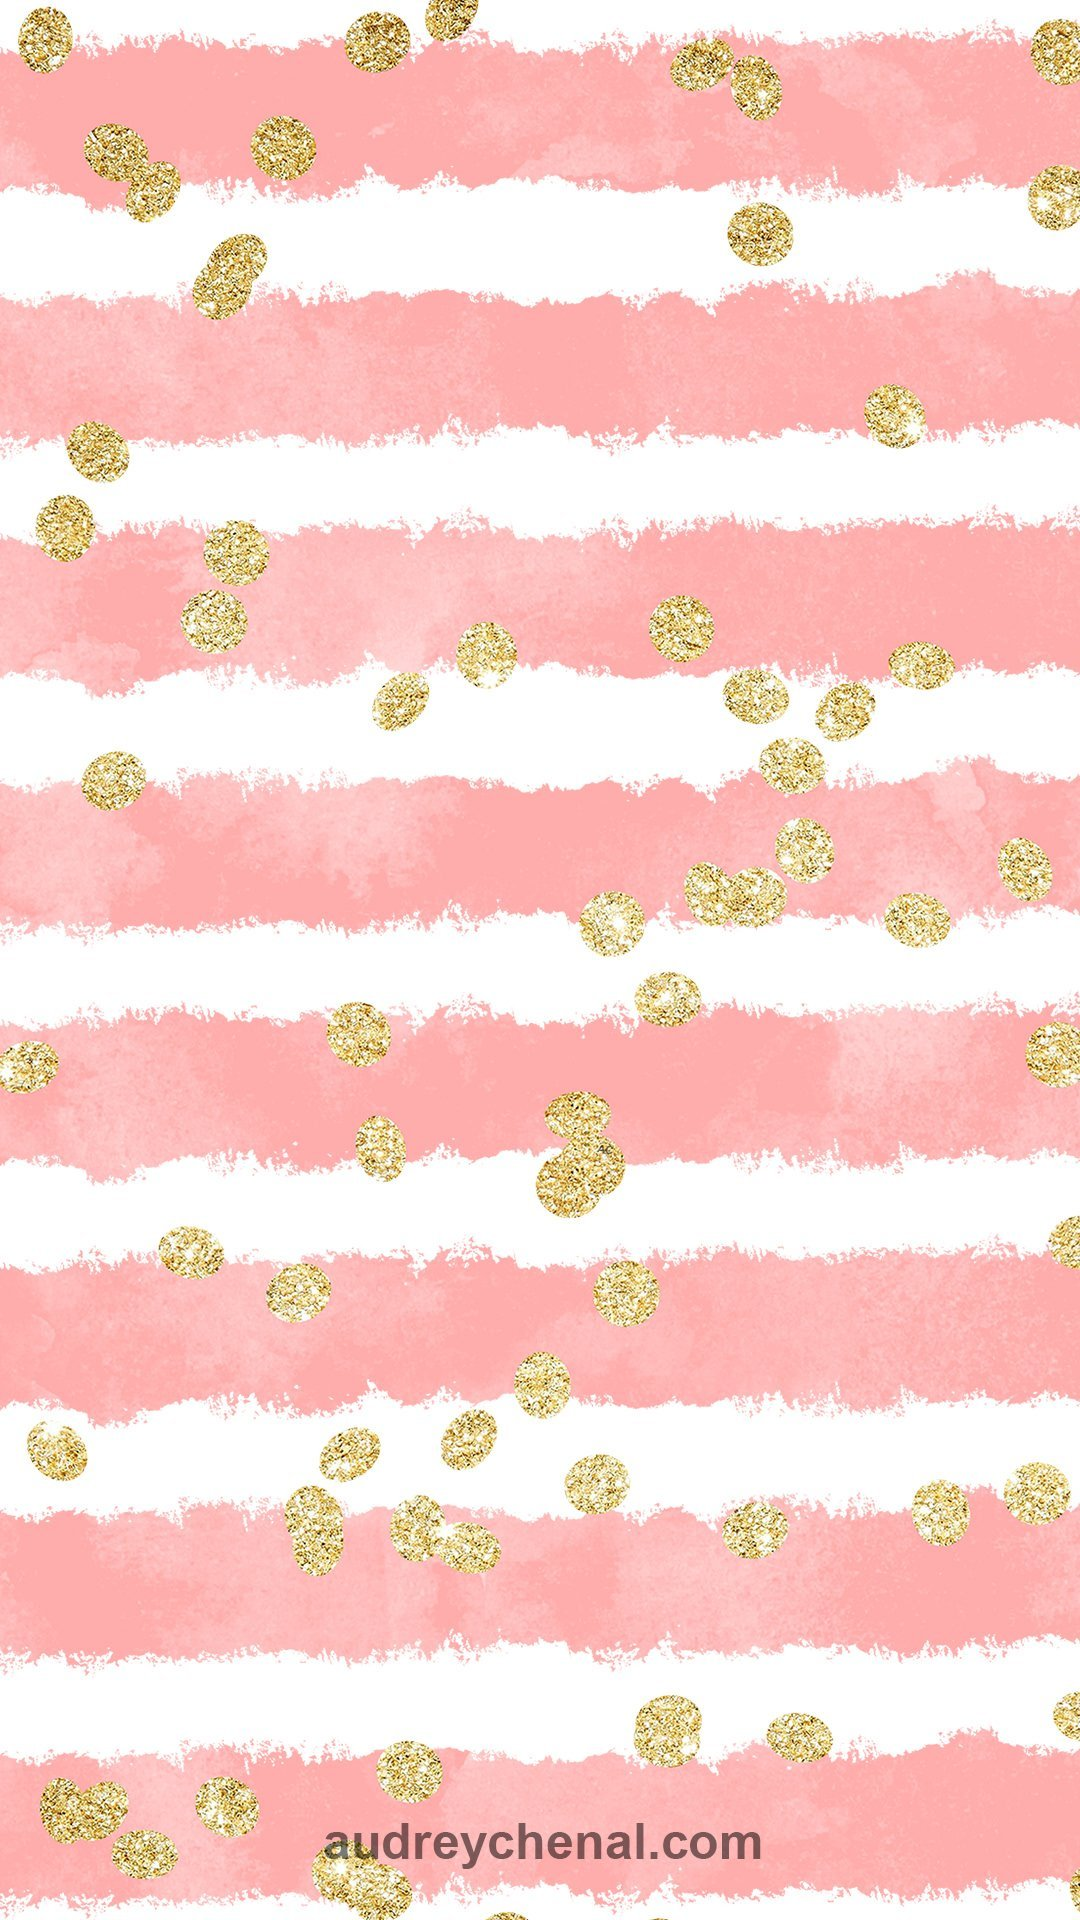 wallpaper blush pink watercolor stripes gold glitter confetti pattern by Audrey Chenal